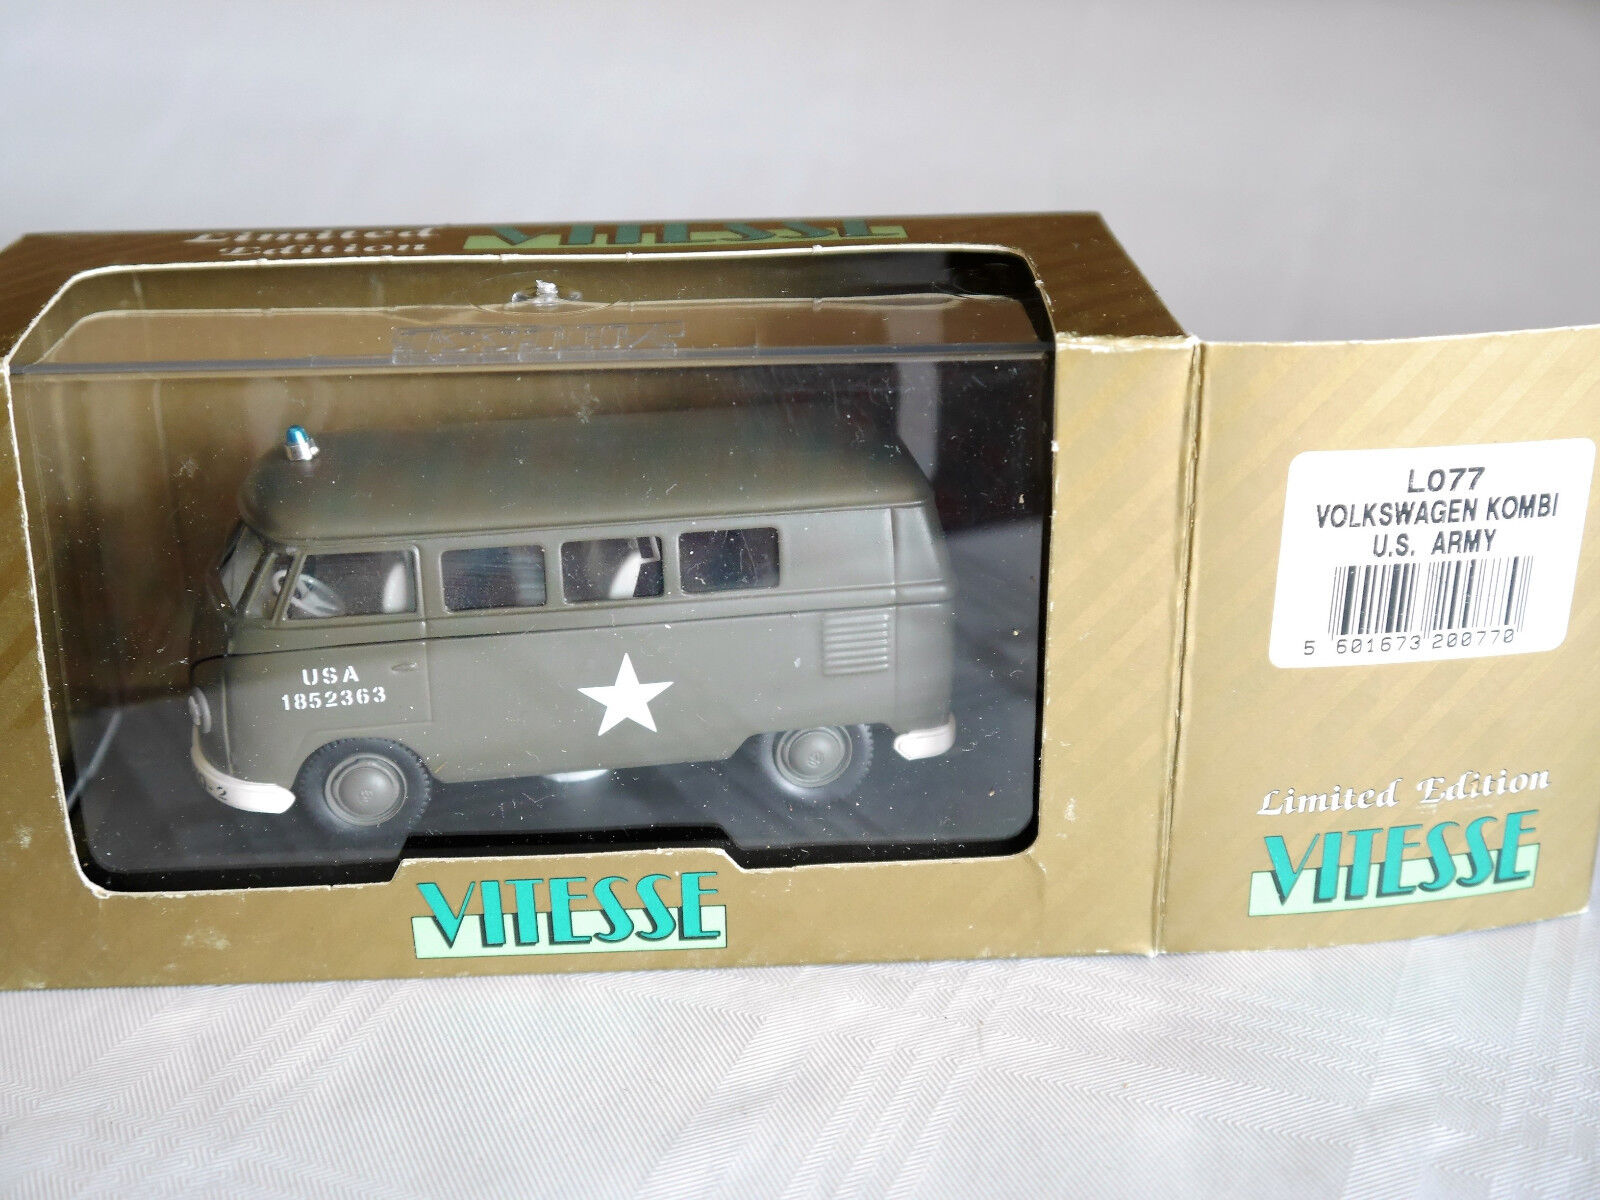 Vw tipo 2 bus US Army estados unidos unidos unidos 1852363 ID-X hq-2 military Olive, Vitesse en 1 43 Boxed 14d198